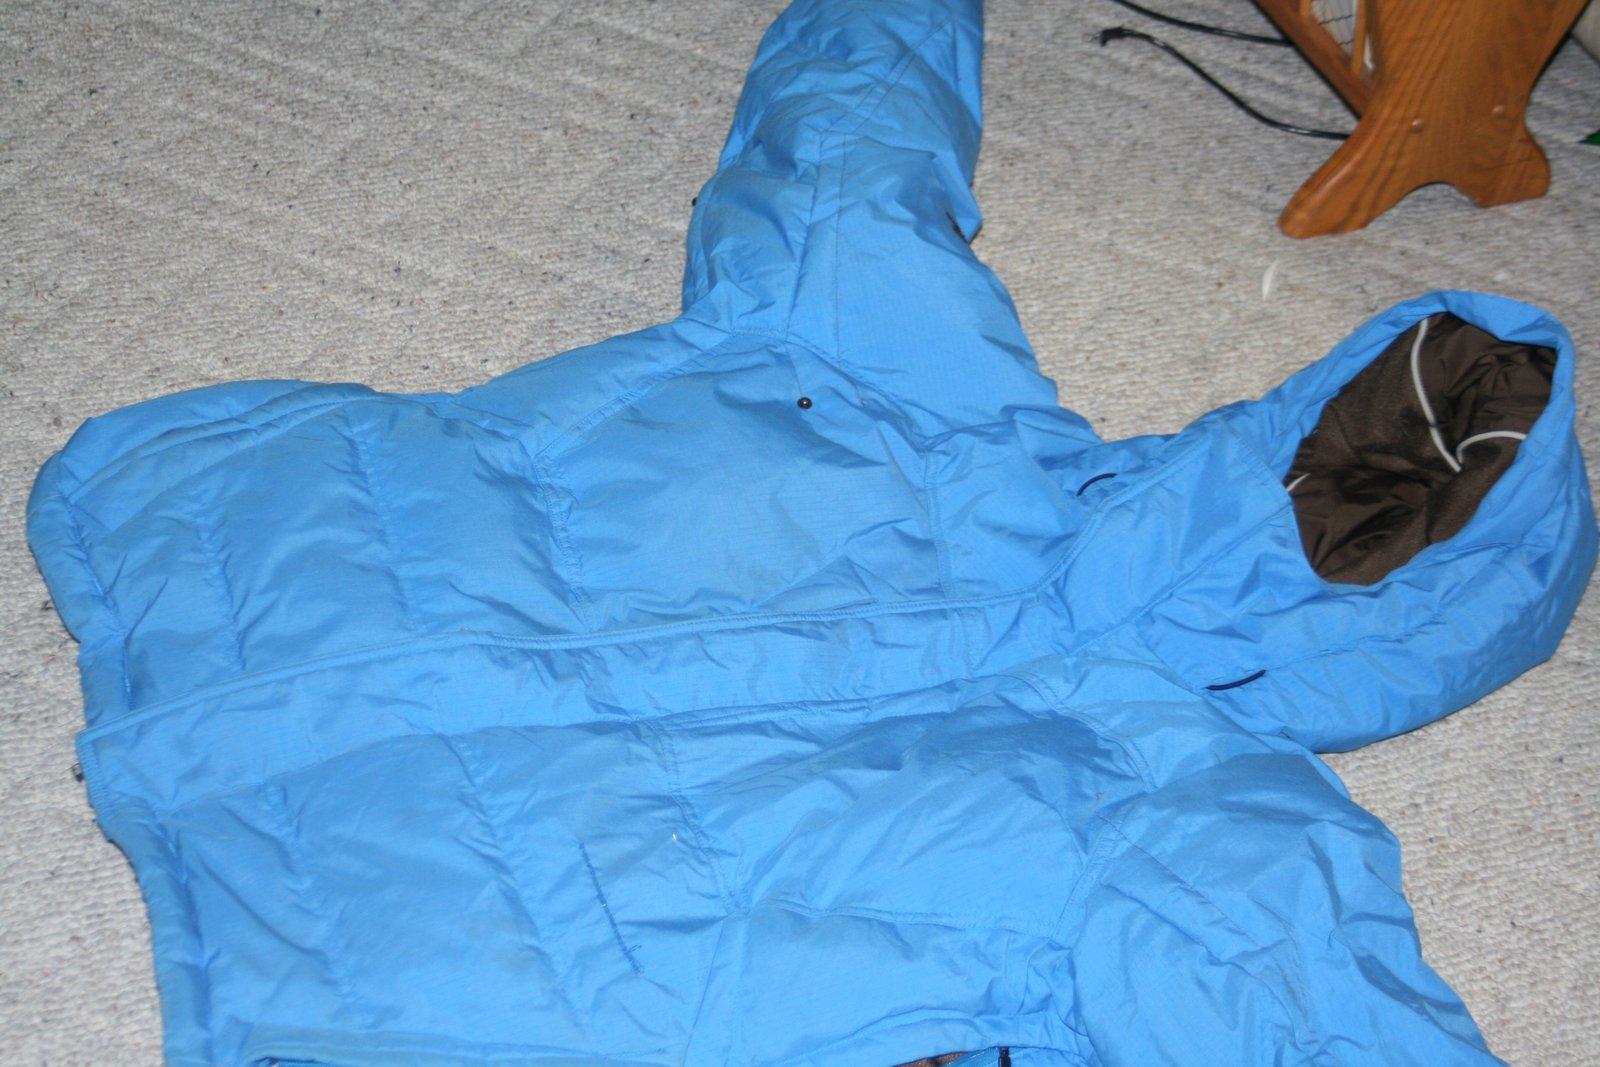 Blue bonfire jacket pic 2